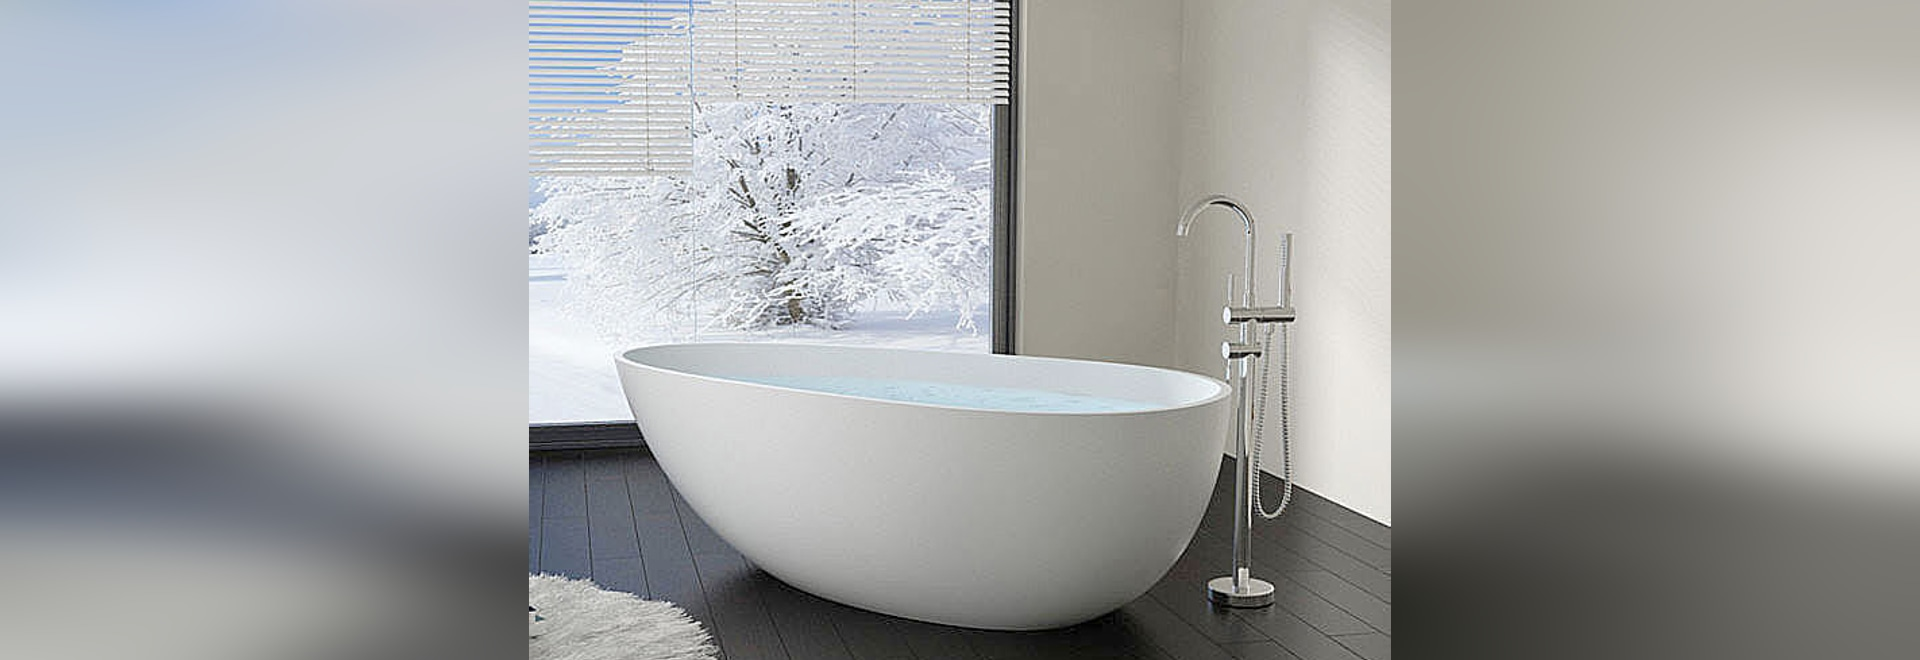 Vasca da bagno indipendente da resina di pietra - Badeloft GmbH